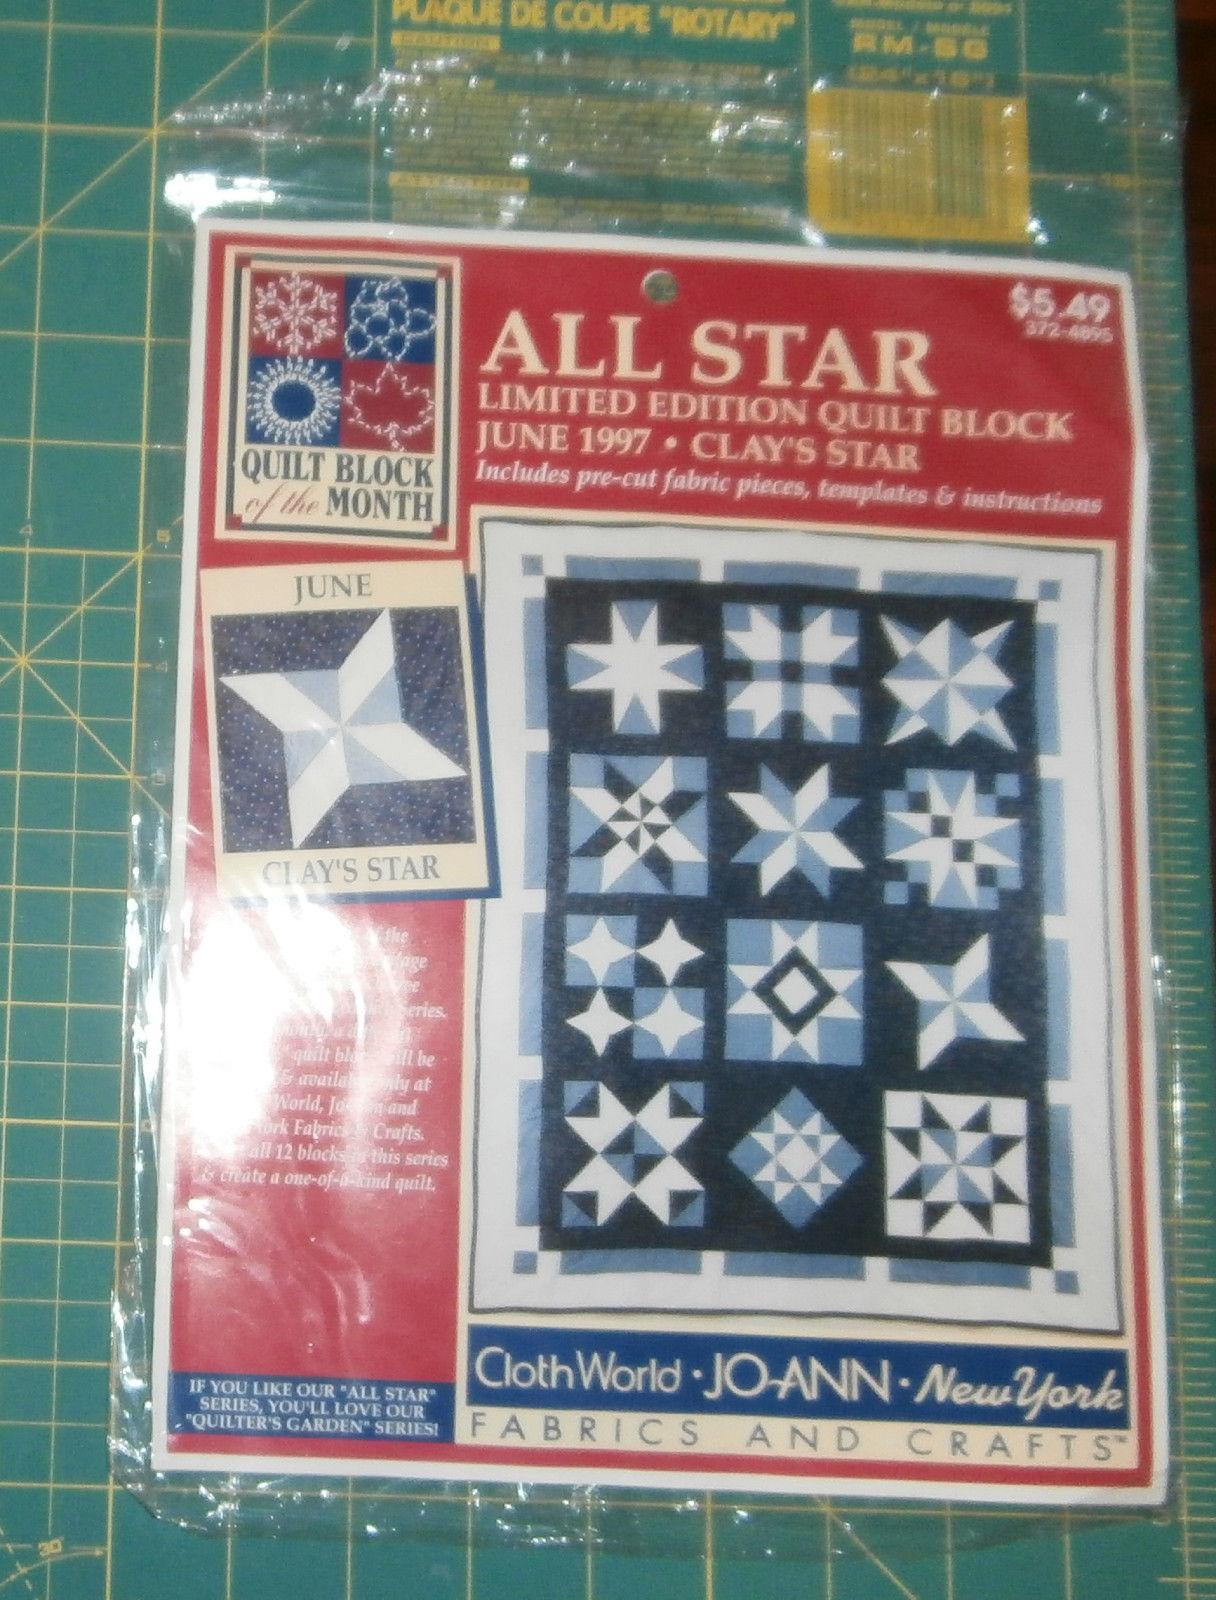 Clay's Star June 1997 All Star Quilt Block and 50 similar items : joann fabrics quilt kits - Adamdwight.com